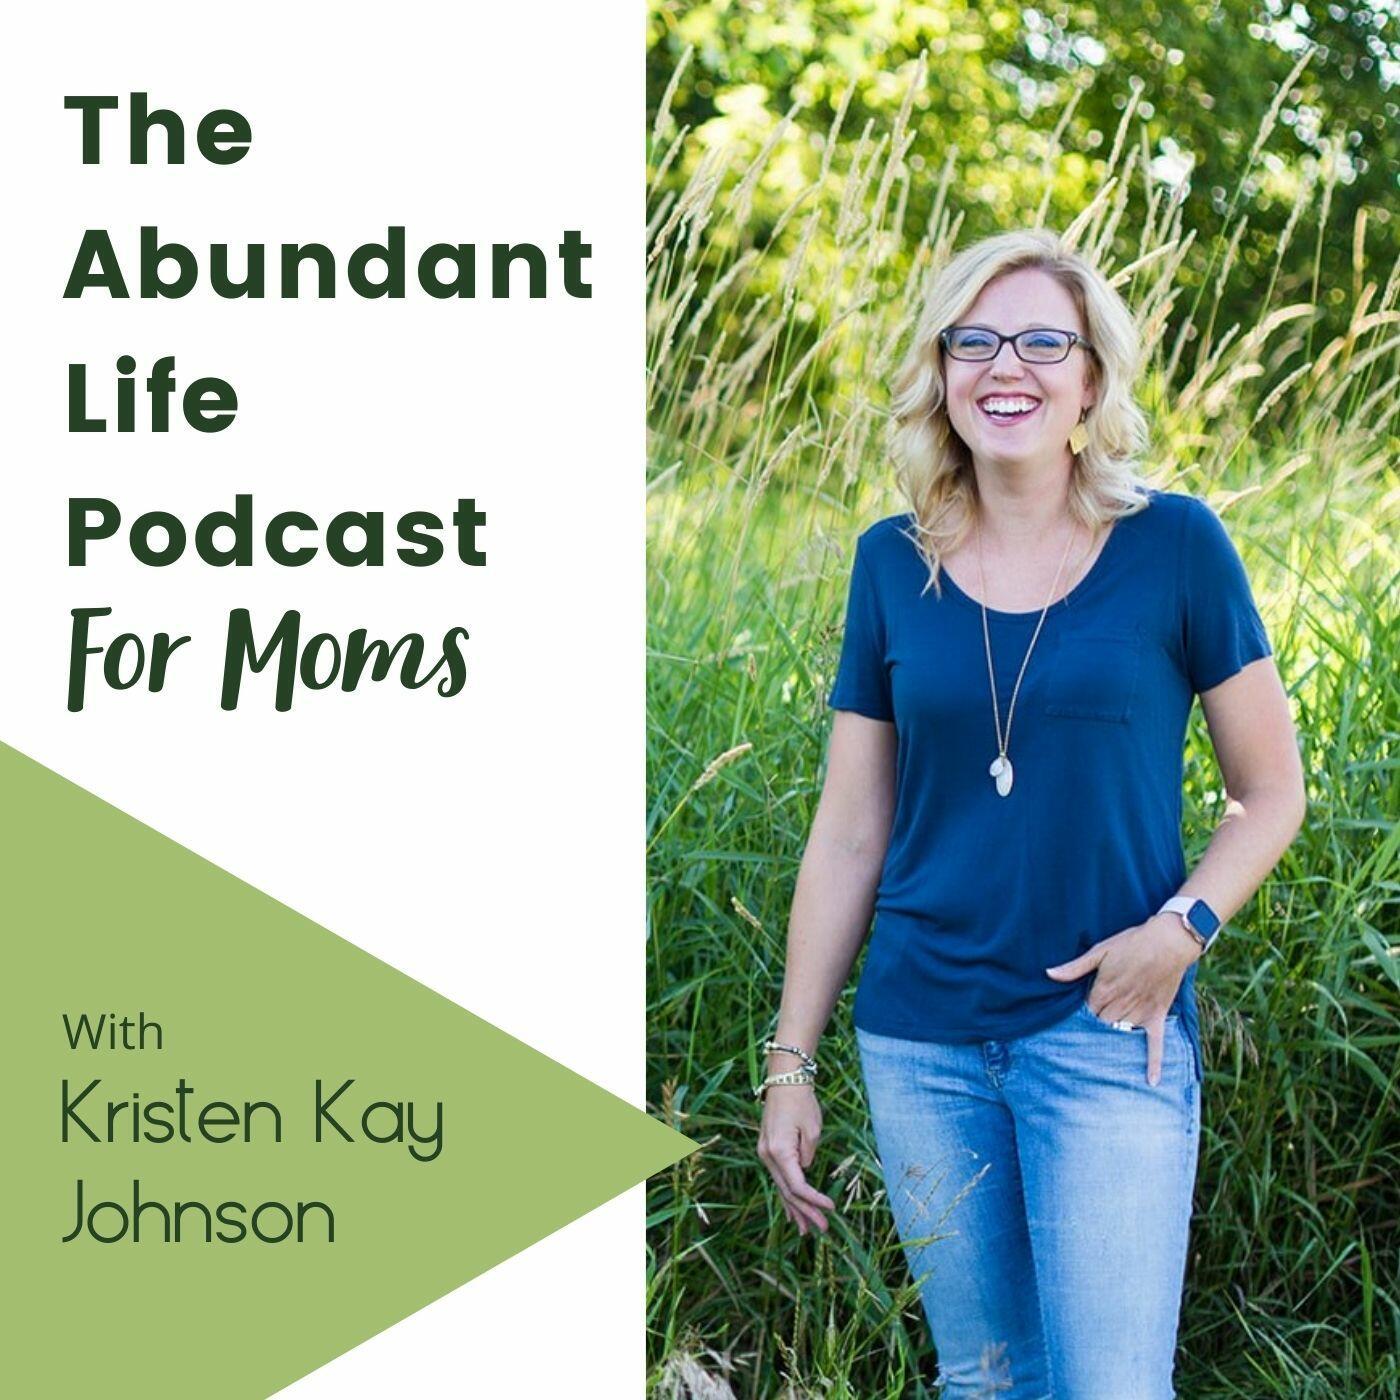 The Abundant Life Podcast for Moms